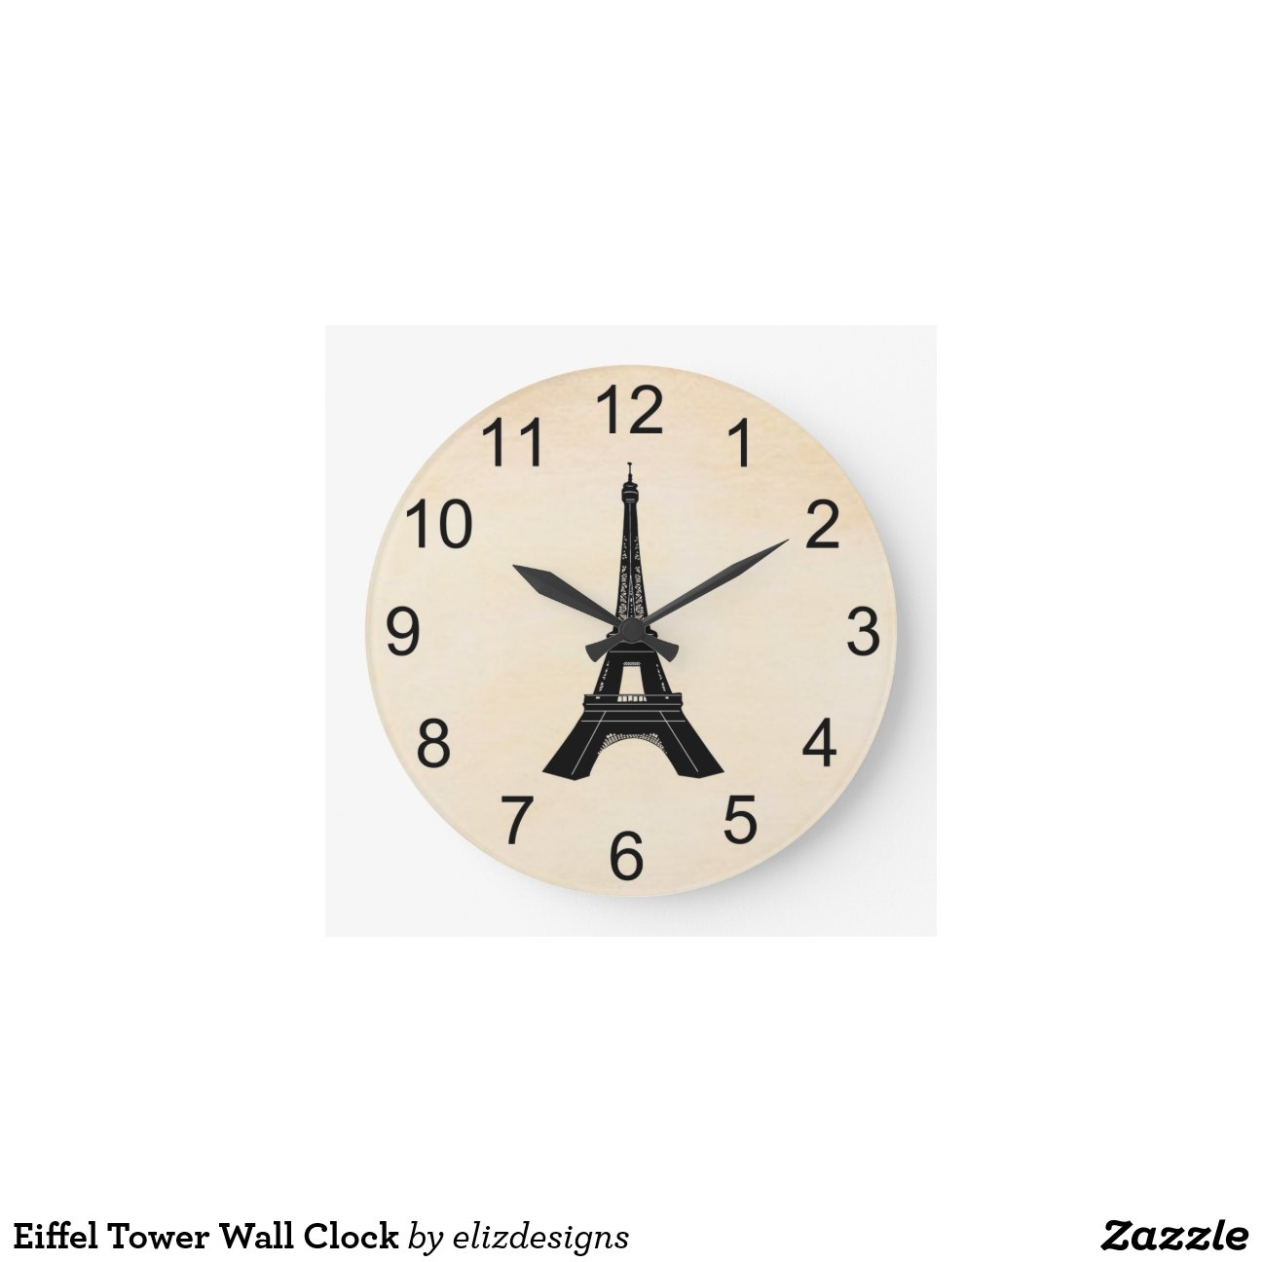 Reloj de pared de la torre eiffel zazzle - Relojes de diseno de pared ...